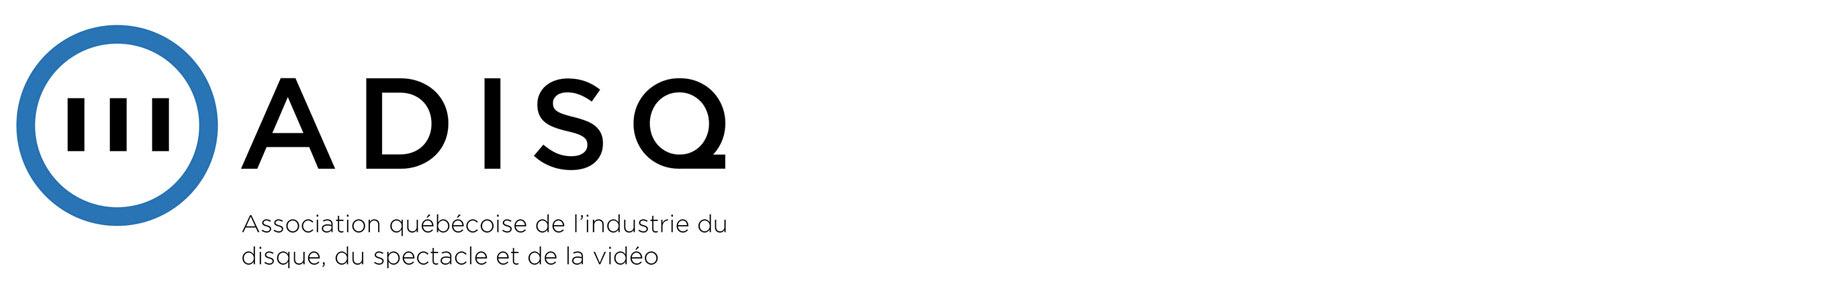 Logo Adisq Couleur Communiqué S